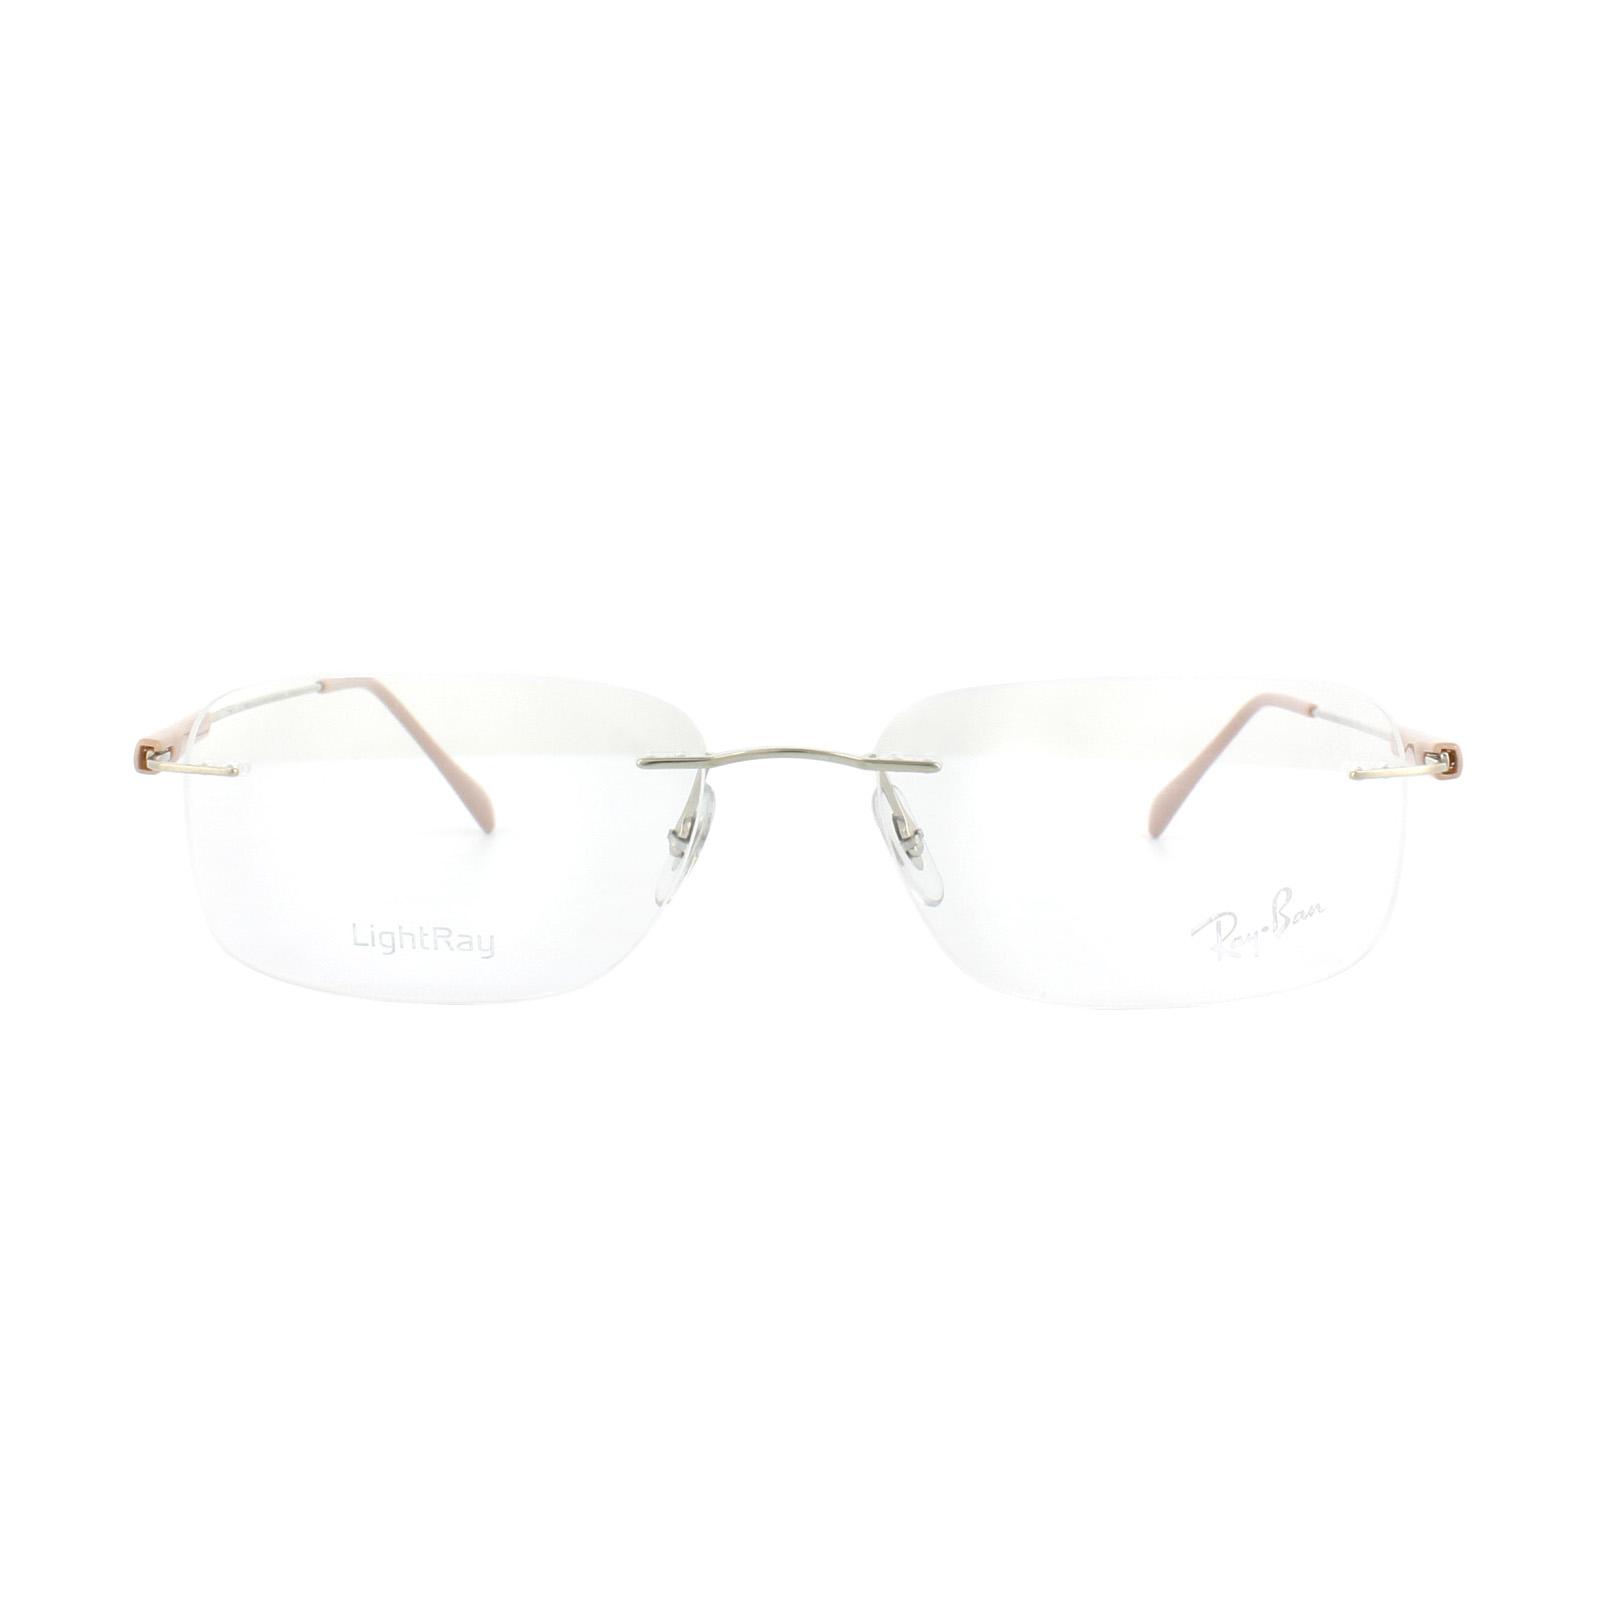 926fb19ca5c Sentinel Ray-Ban Glasses Frames RX 8712 1145 Silver Nude Mens 55mm